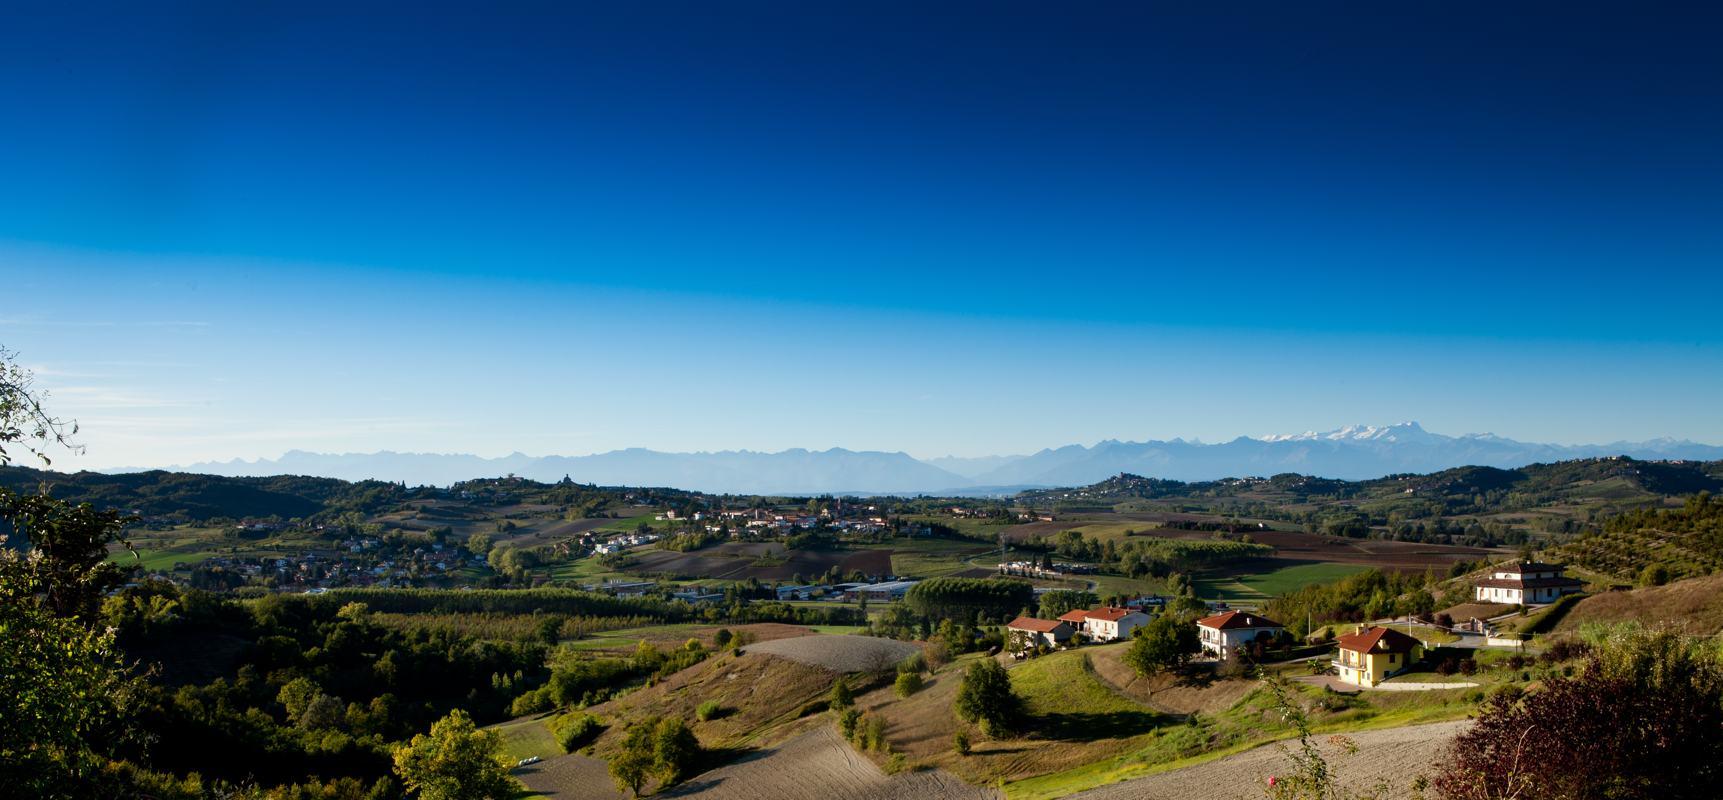 Tour enologici - Vista da Montaldo - Agriturismo Parco del Grep - Monferrato, Piemonte